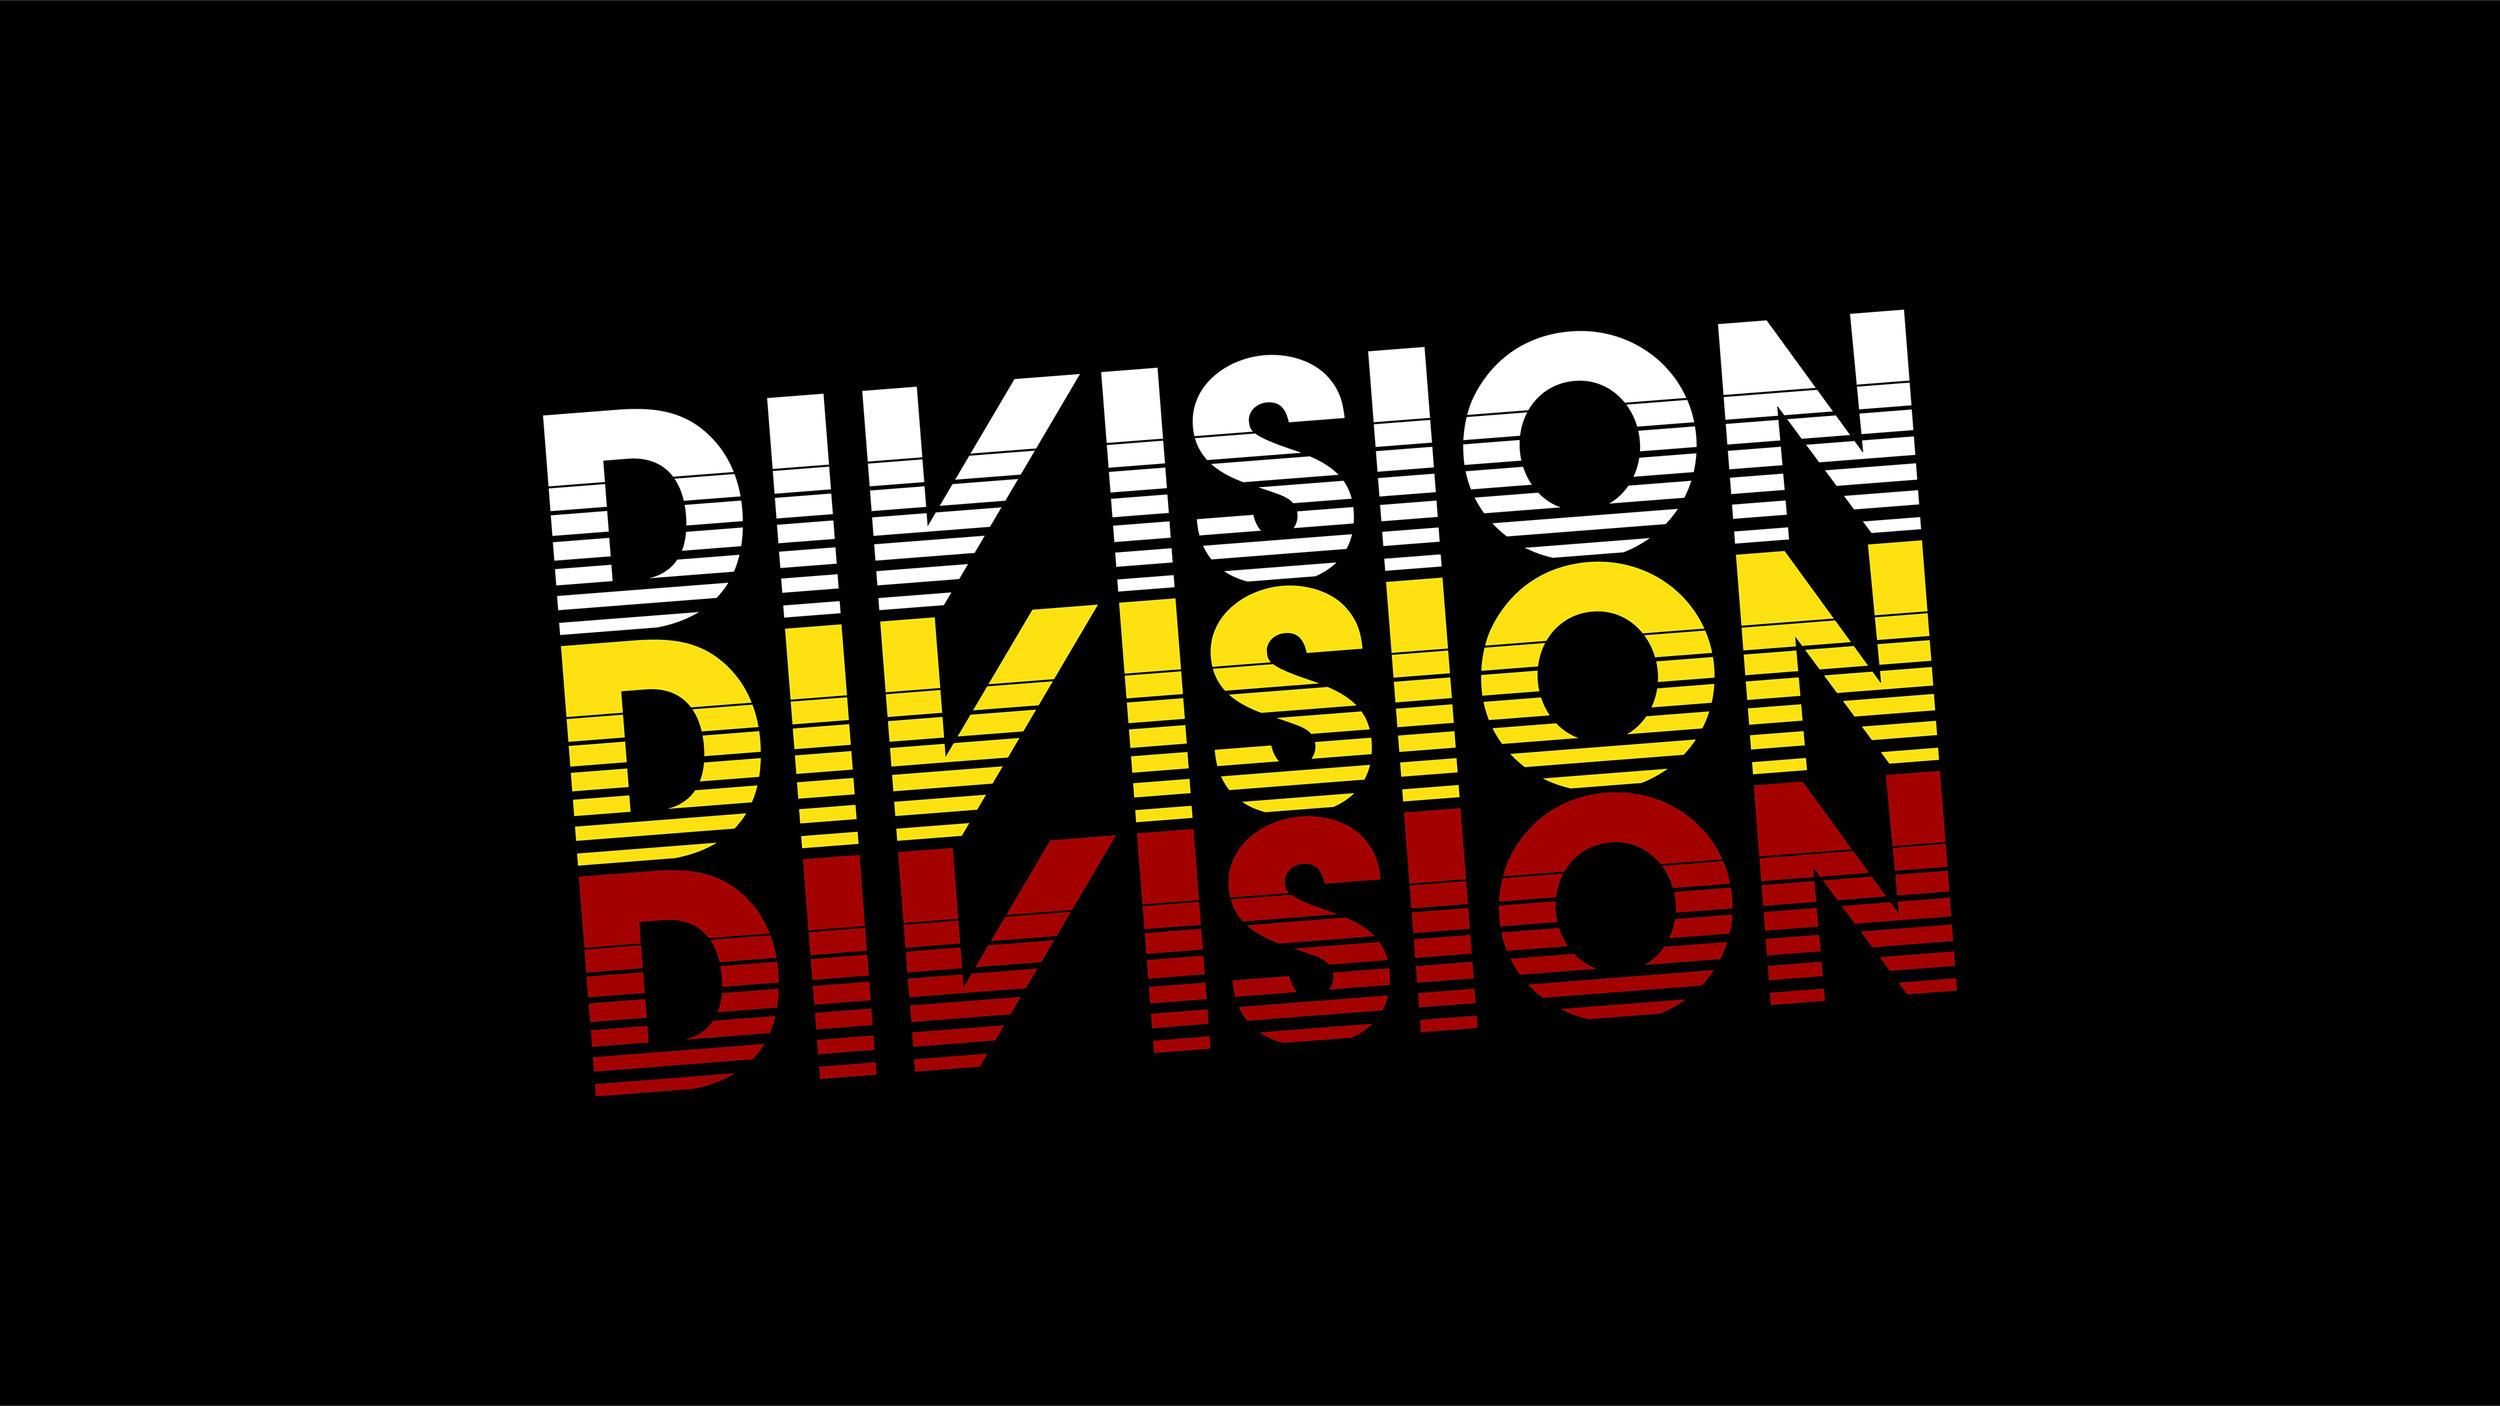 Division_4K.jpg